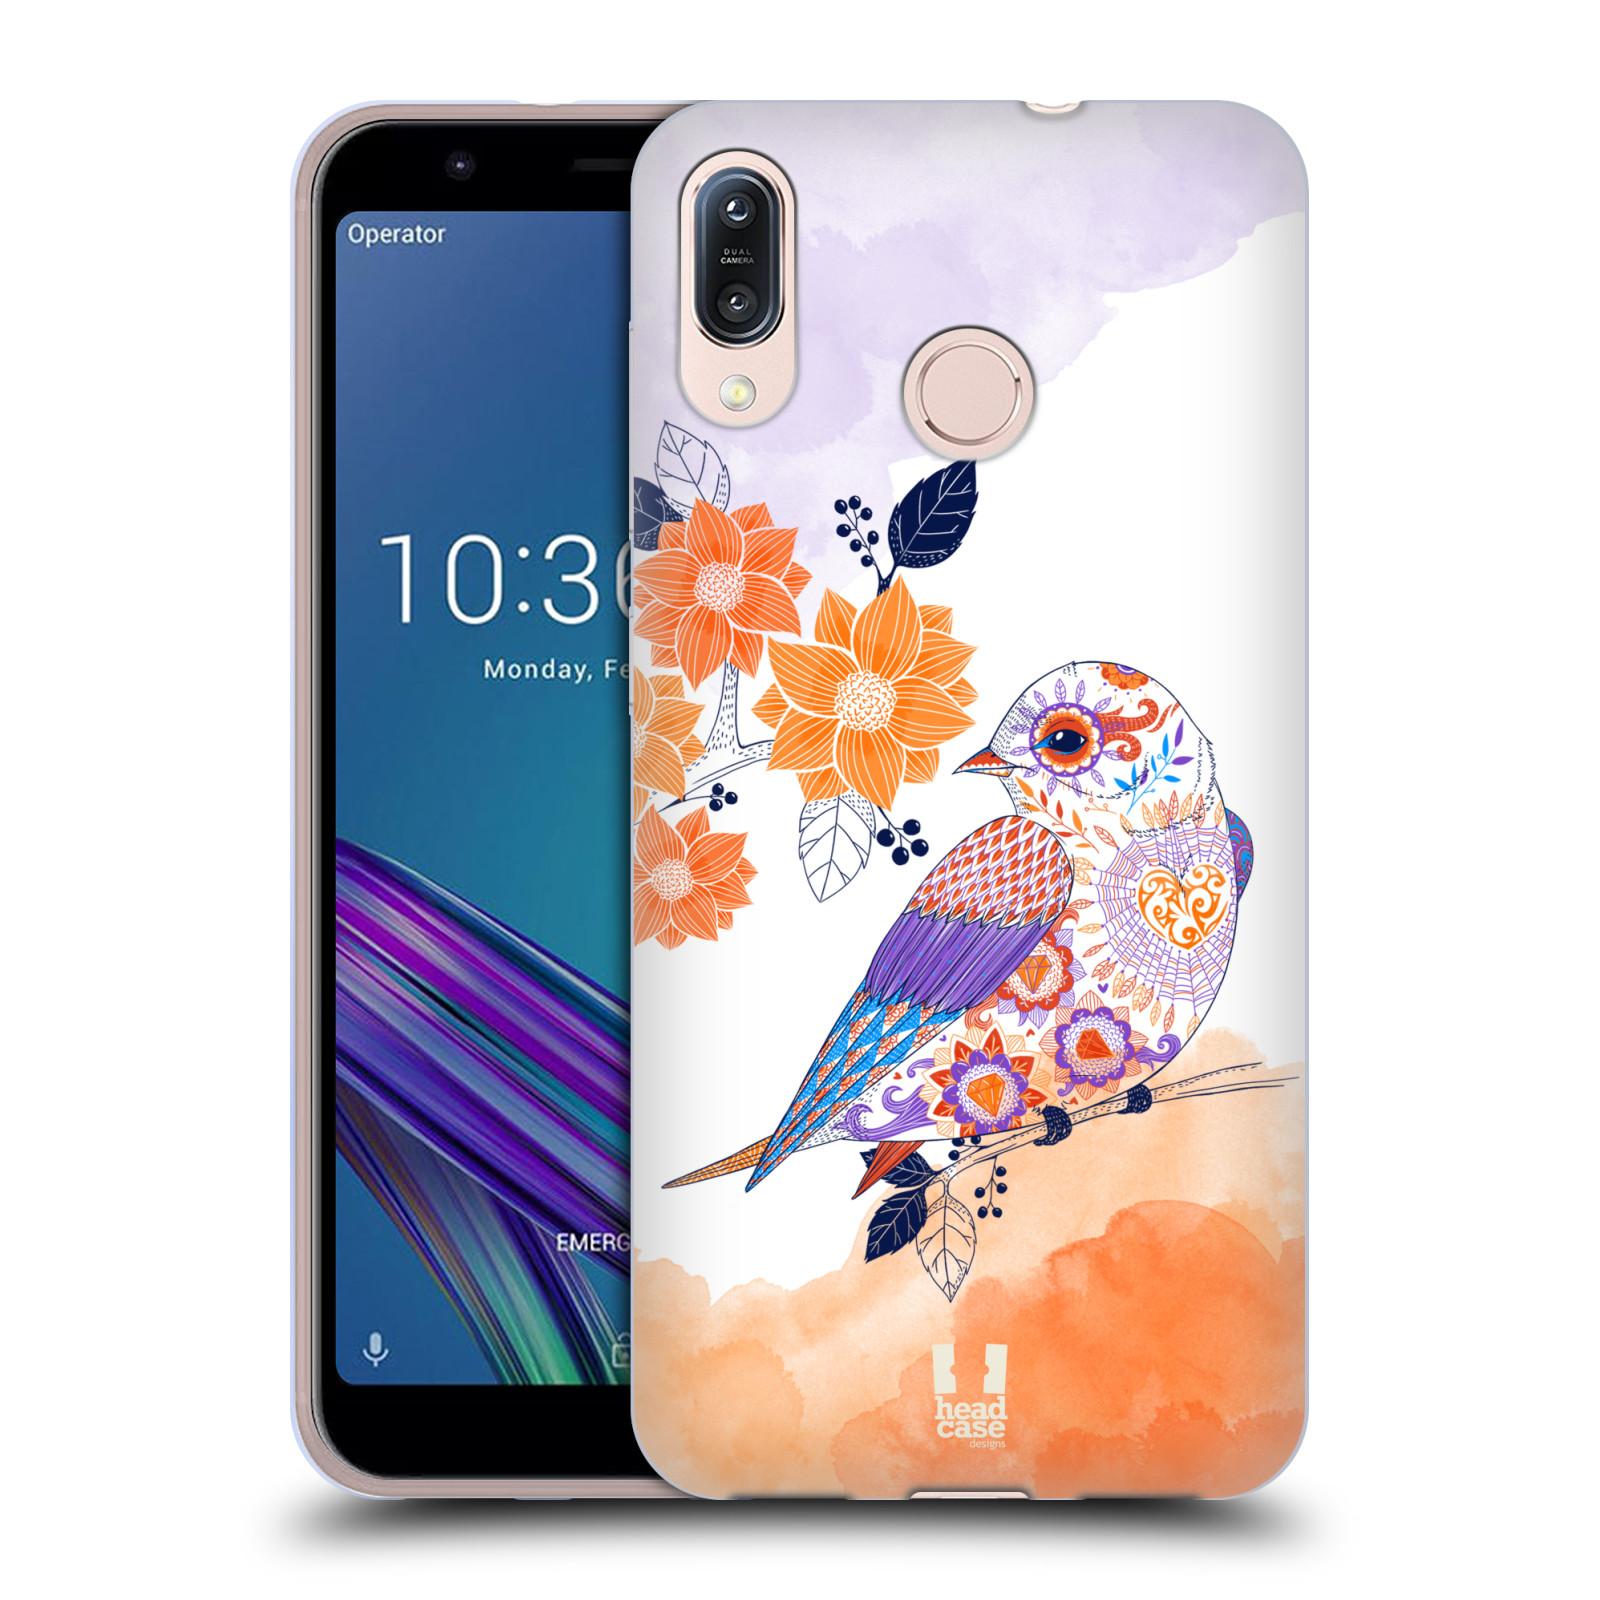 Silikonové pouzdro na mobil Asus Zenfone Max M1 ZB555KL - Head Case - PTÁČEK TANGERINE